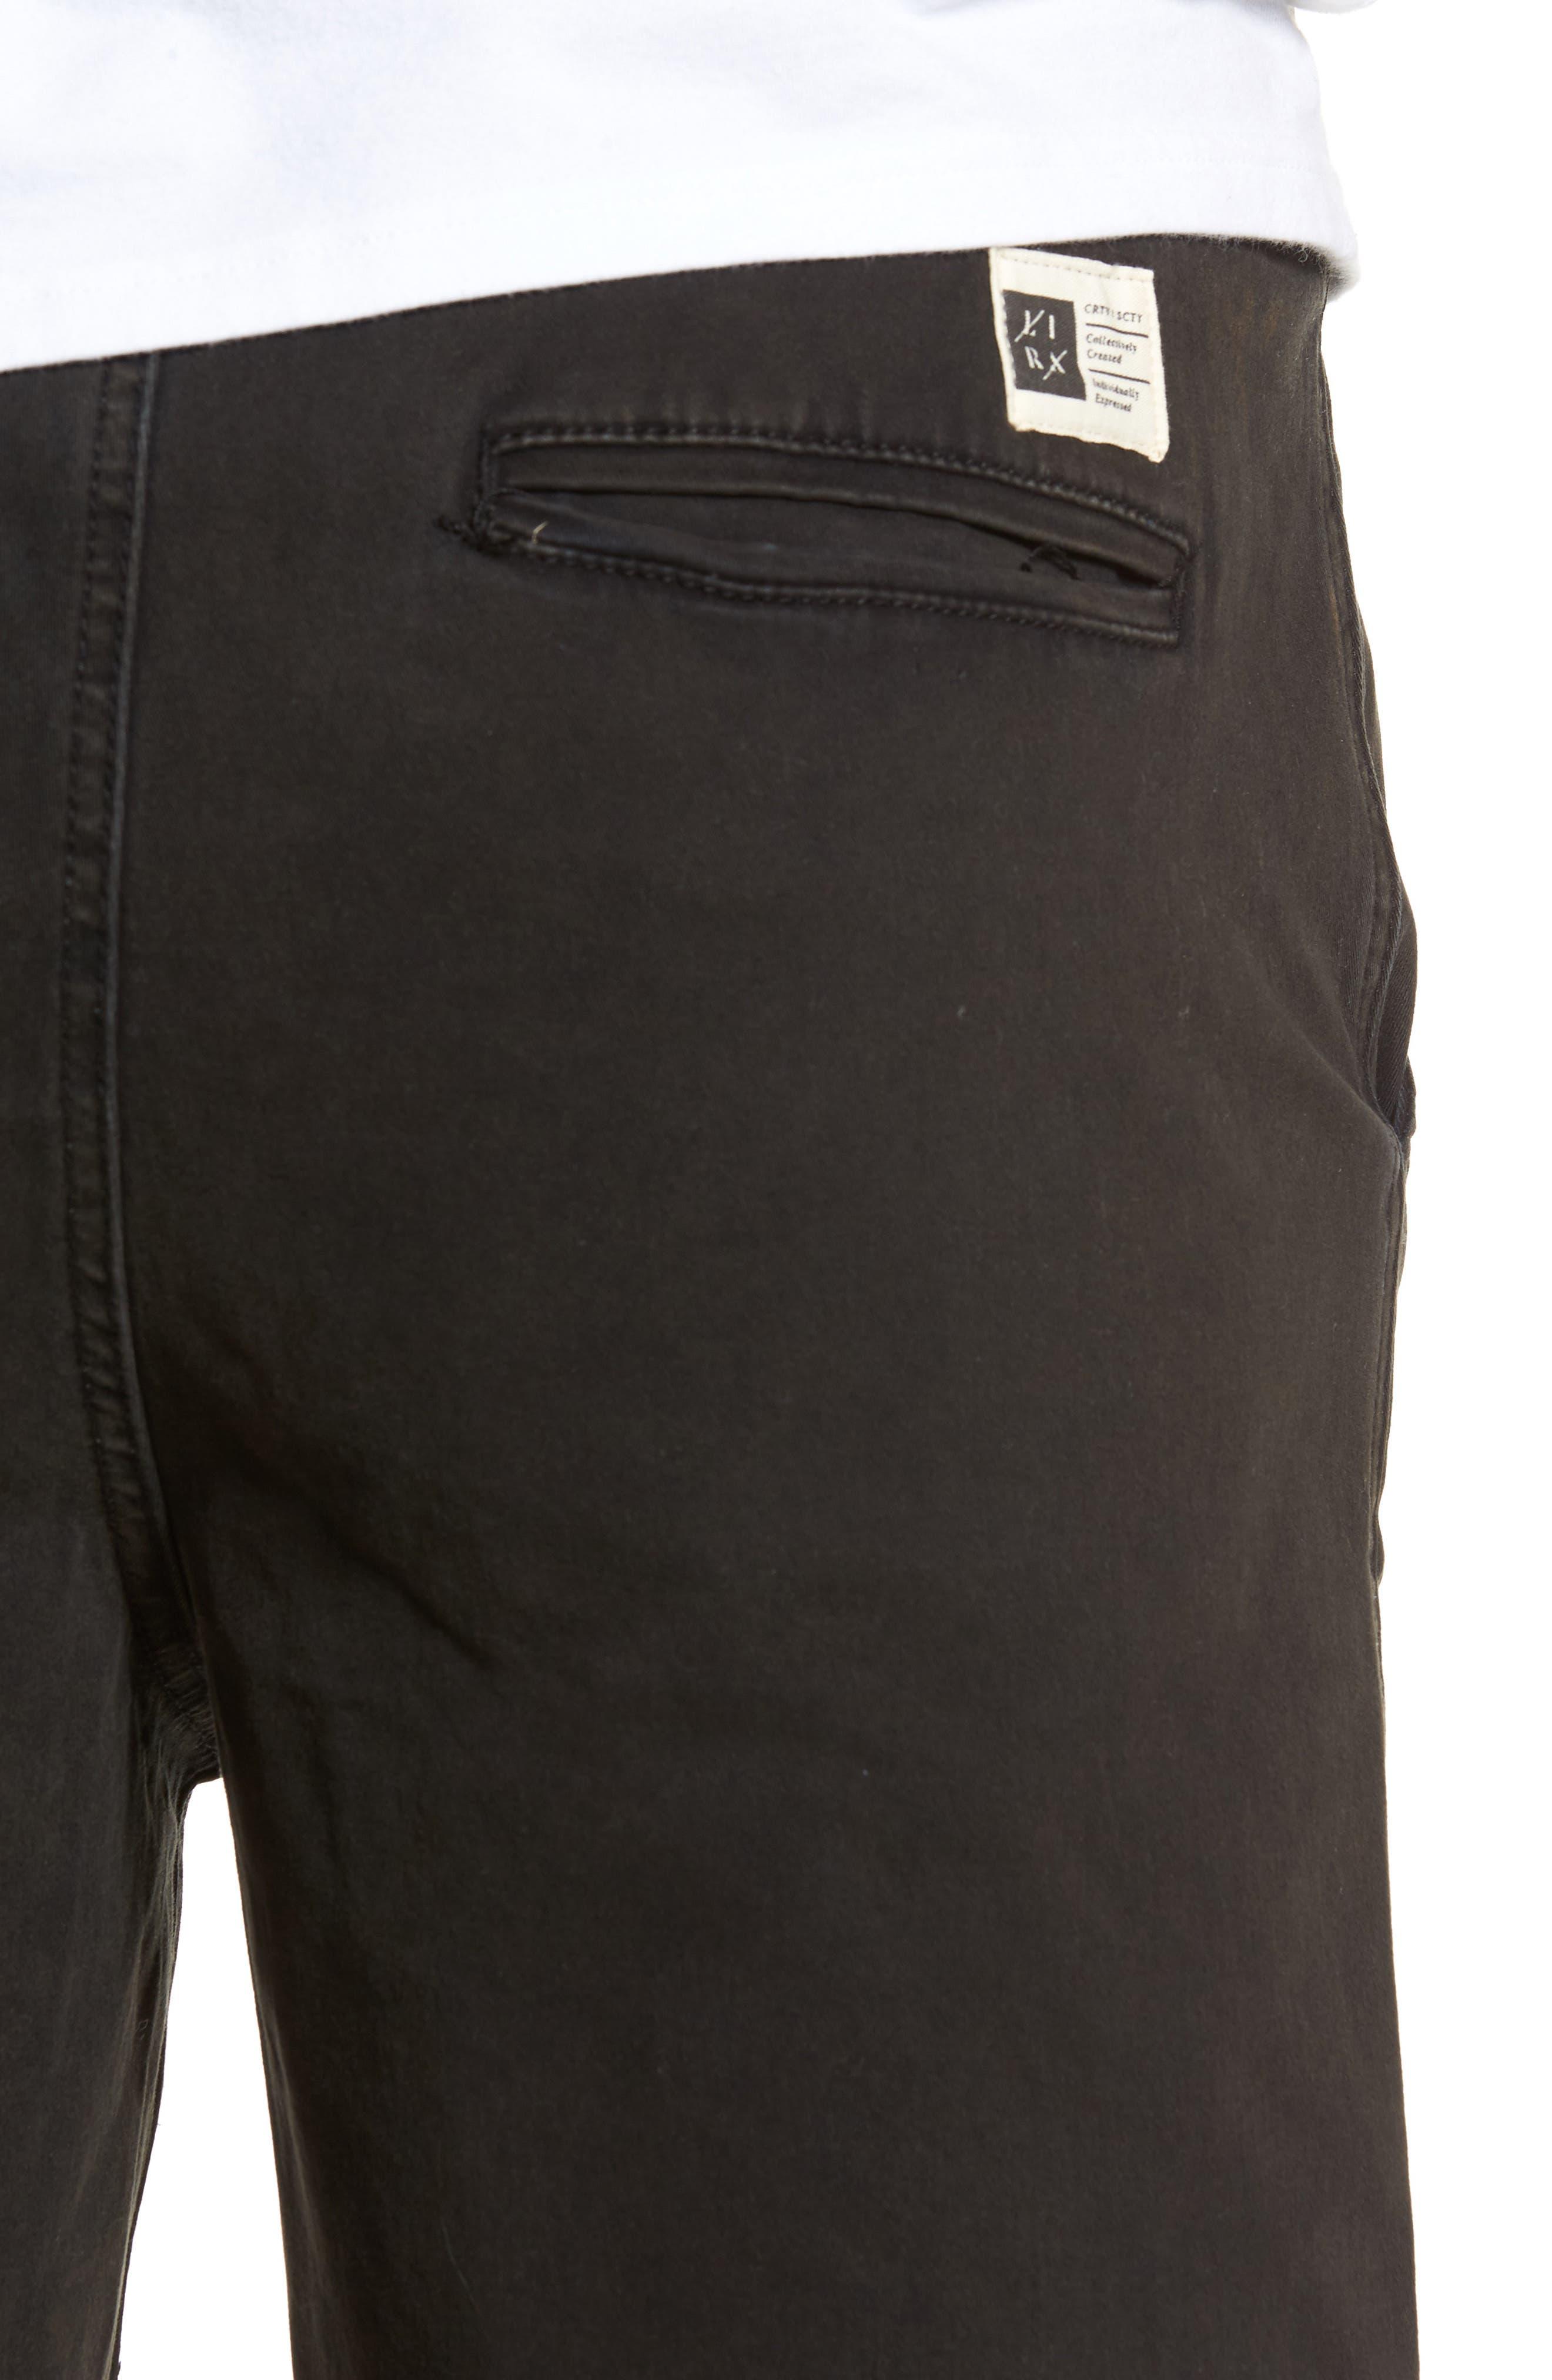 Frazier Walk Shorts,                             Alternate thumbnail 4, color,                             001